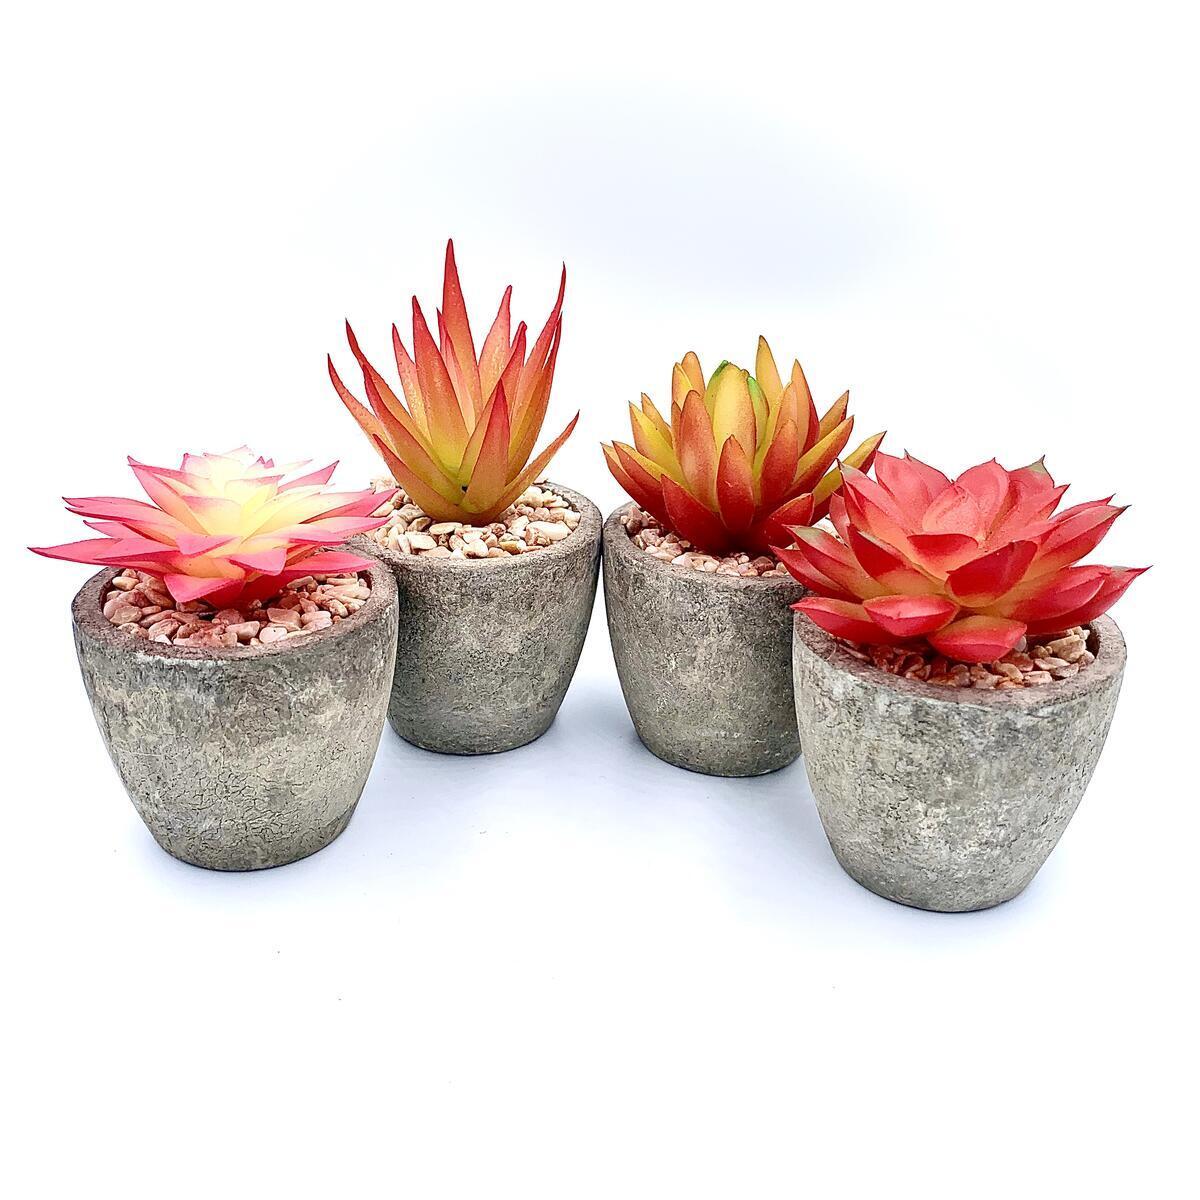 SET OF 4 Lbee Home Artificial Mini Plants - Tropical Colors